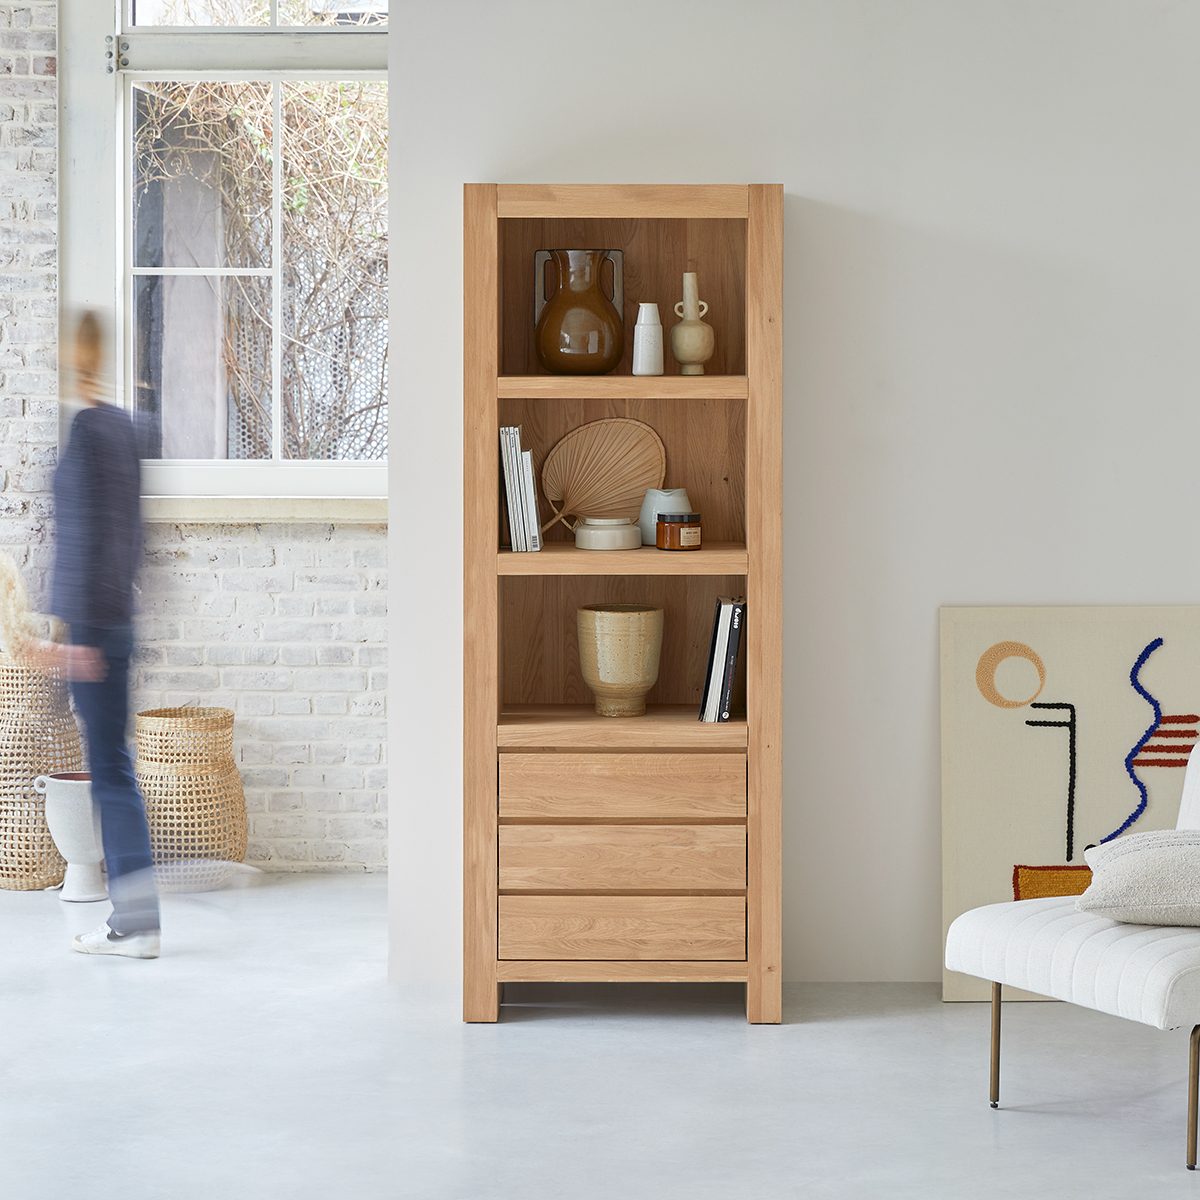 Eden solid oak bookcase 75x200